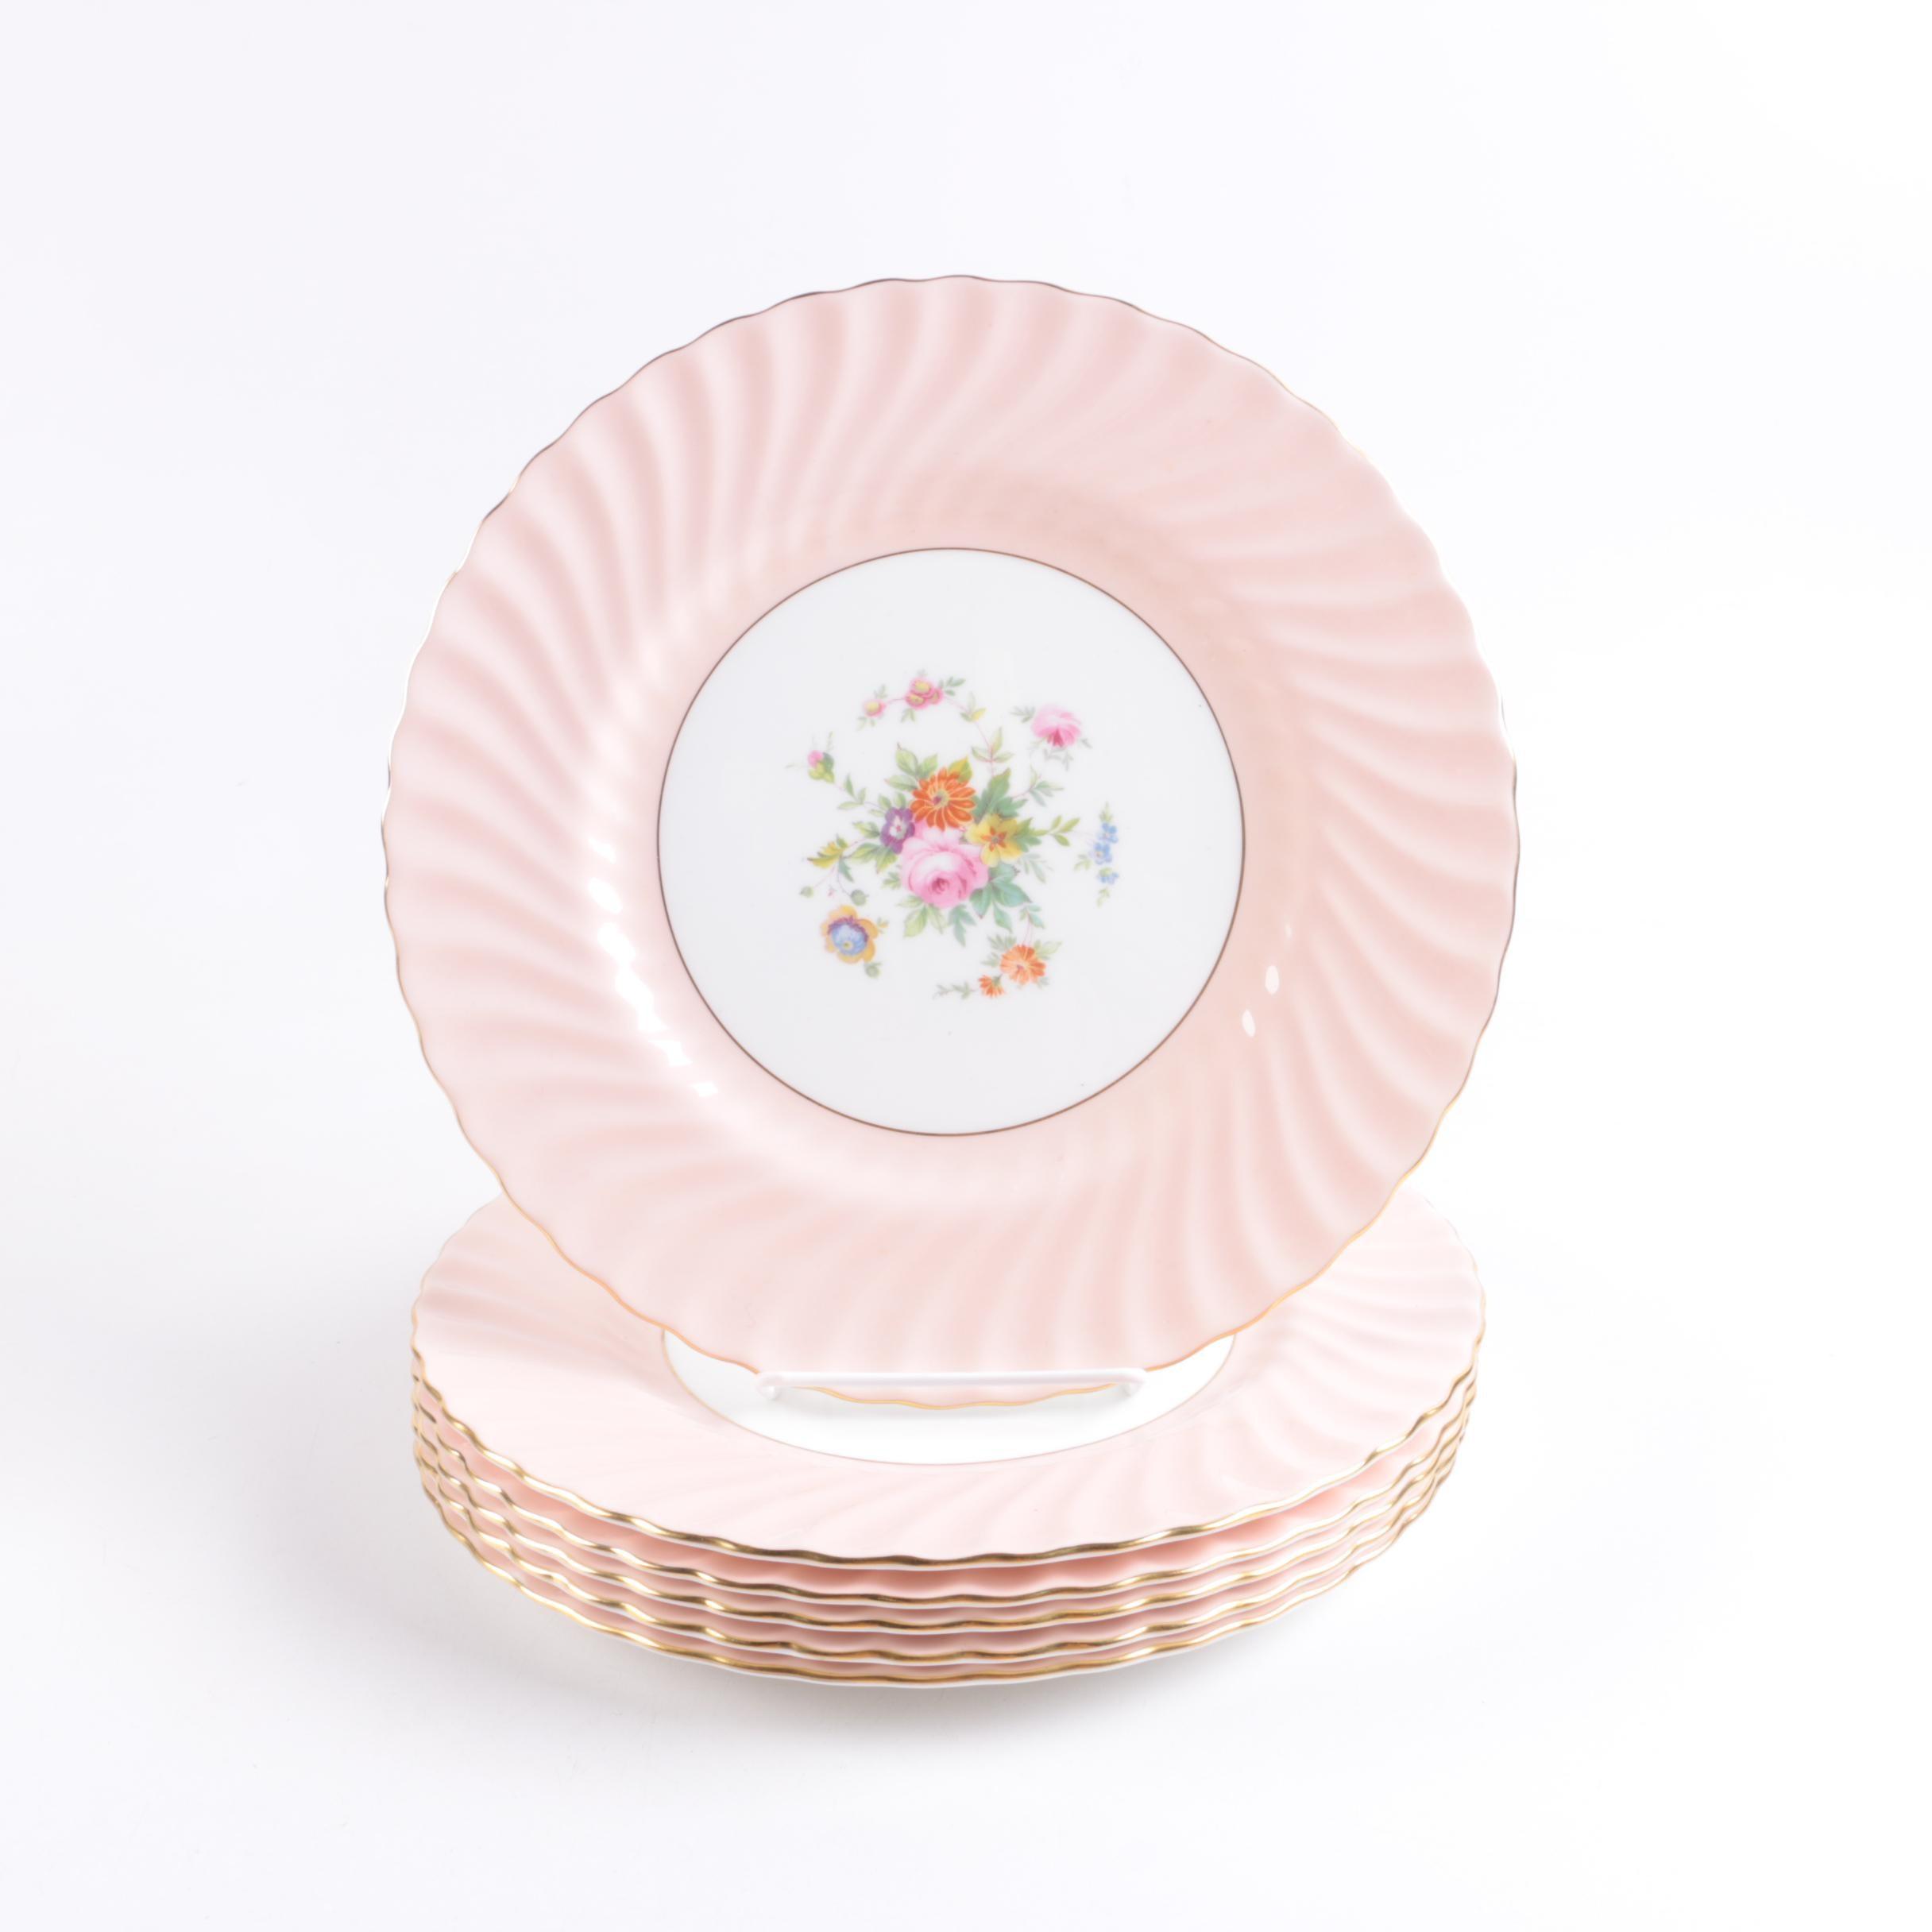 Six Minton Pink Bone China Porcelain Plates